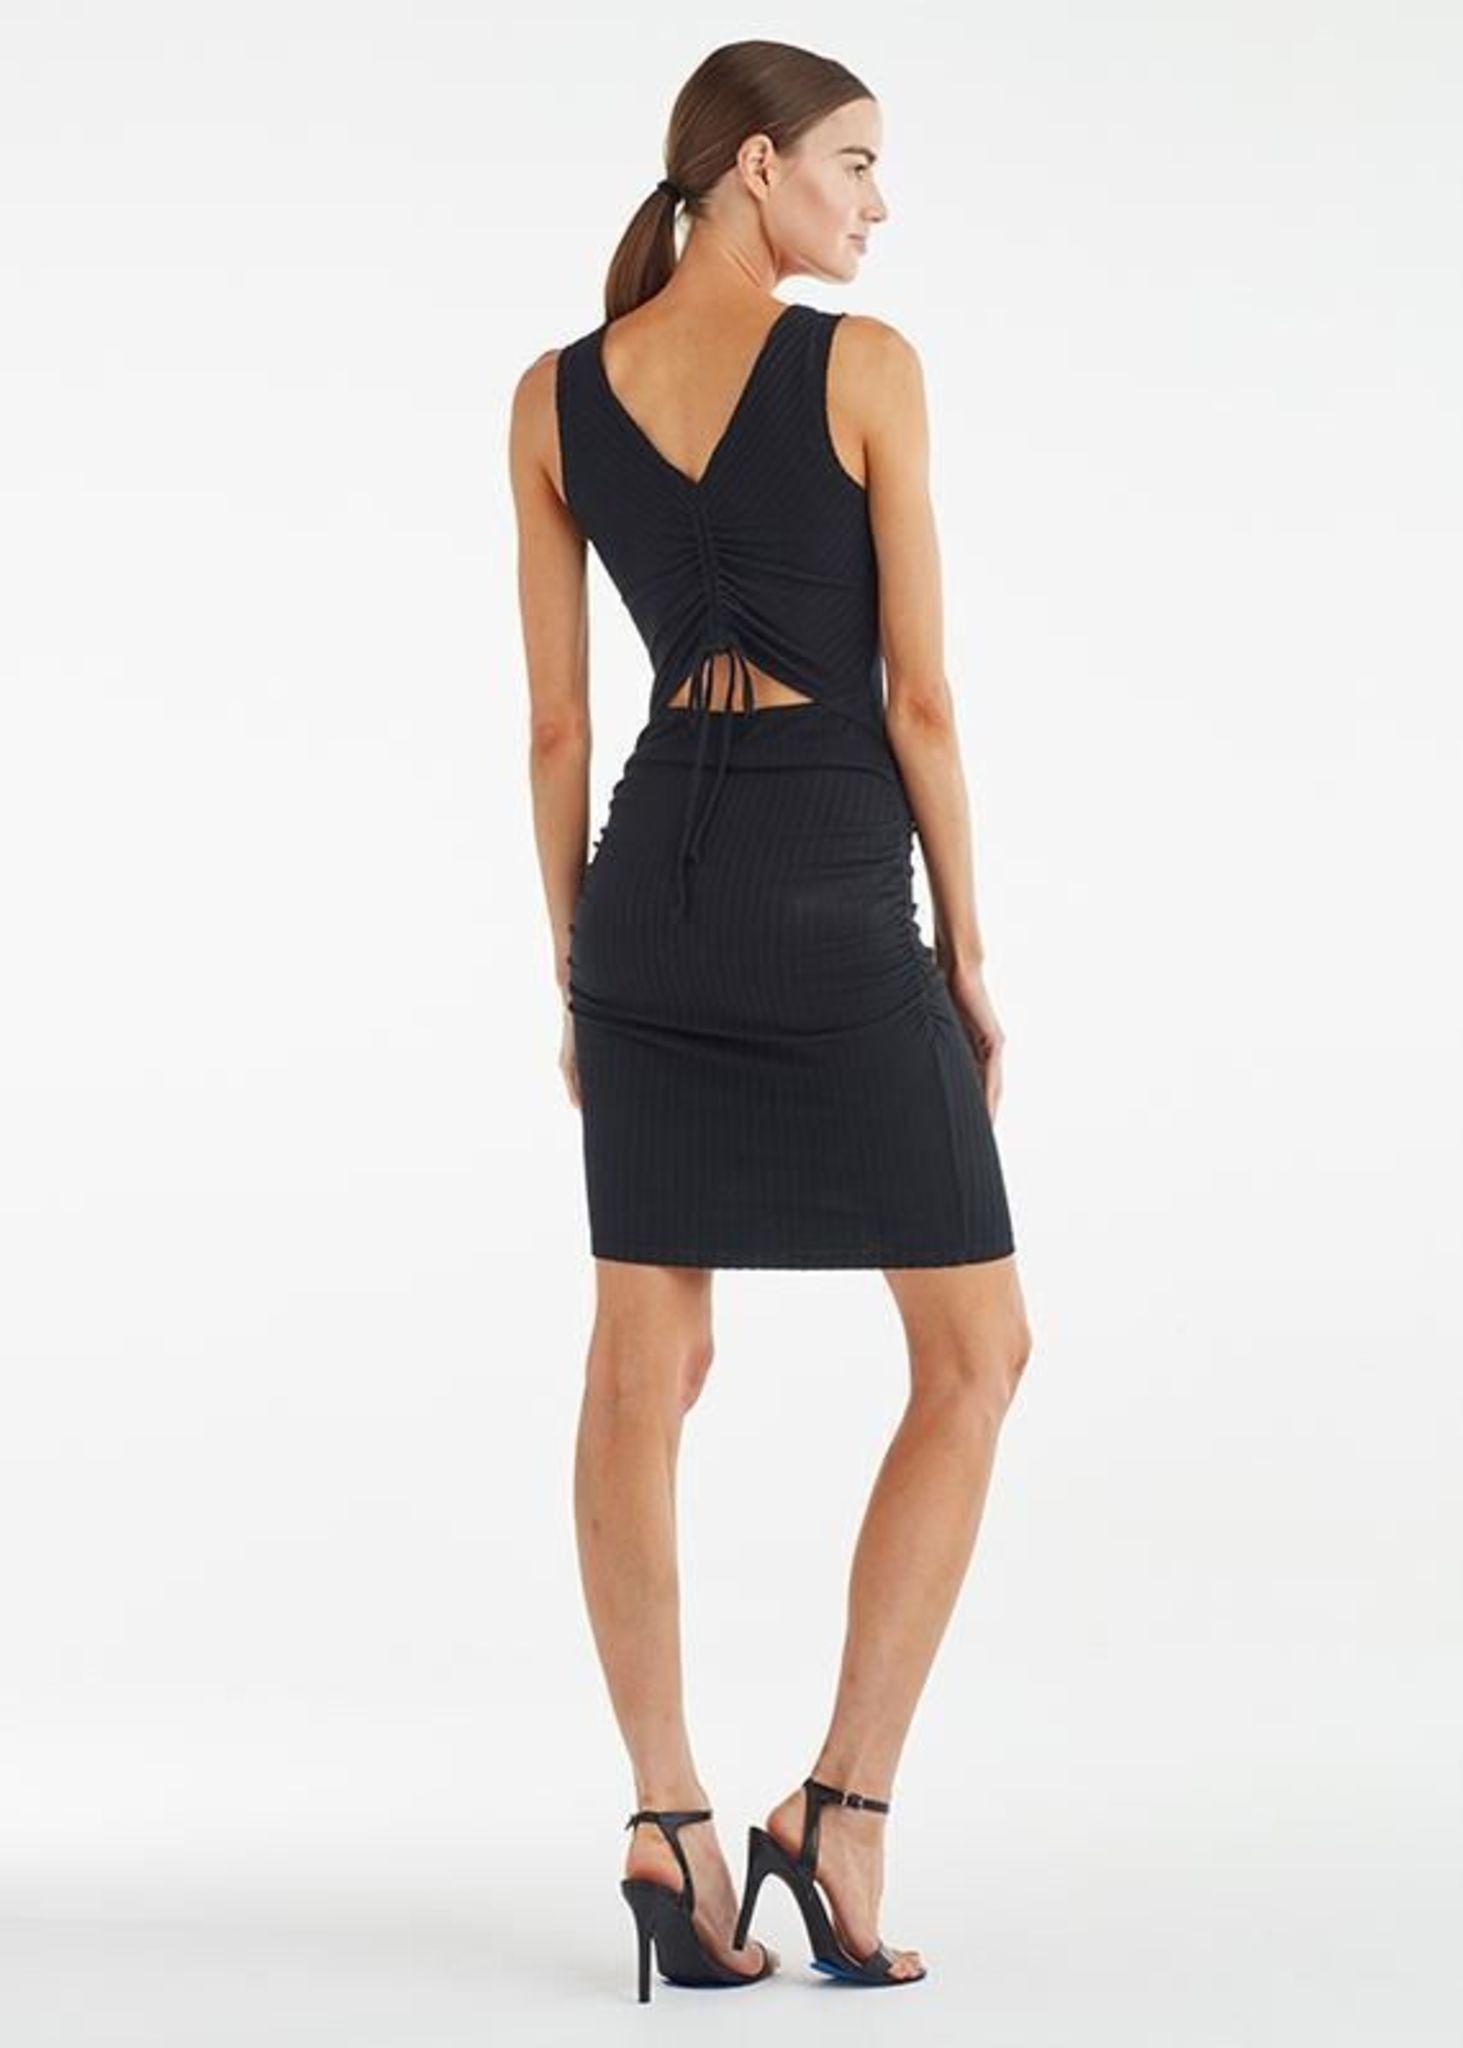 Scrunch Back Dress Black Dresses Black Dress Dress Backs [ 2048 x 1463 Pixel ]